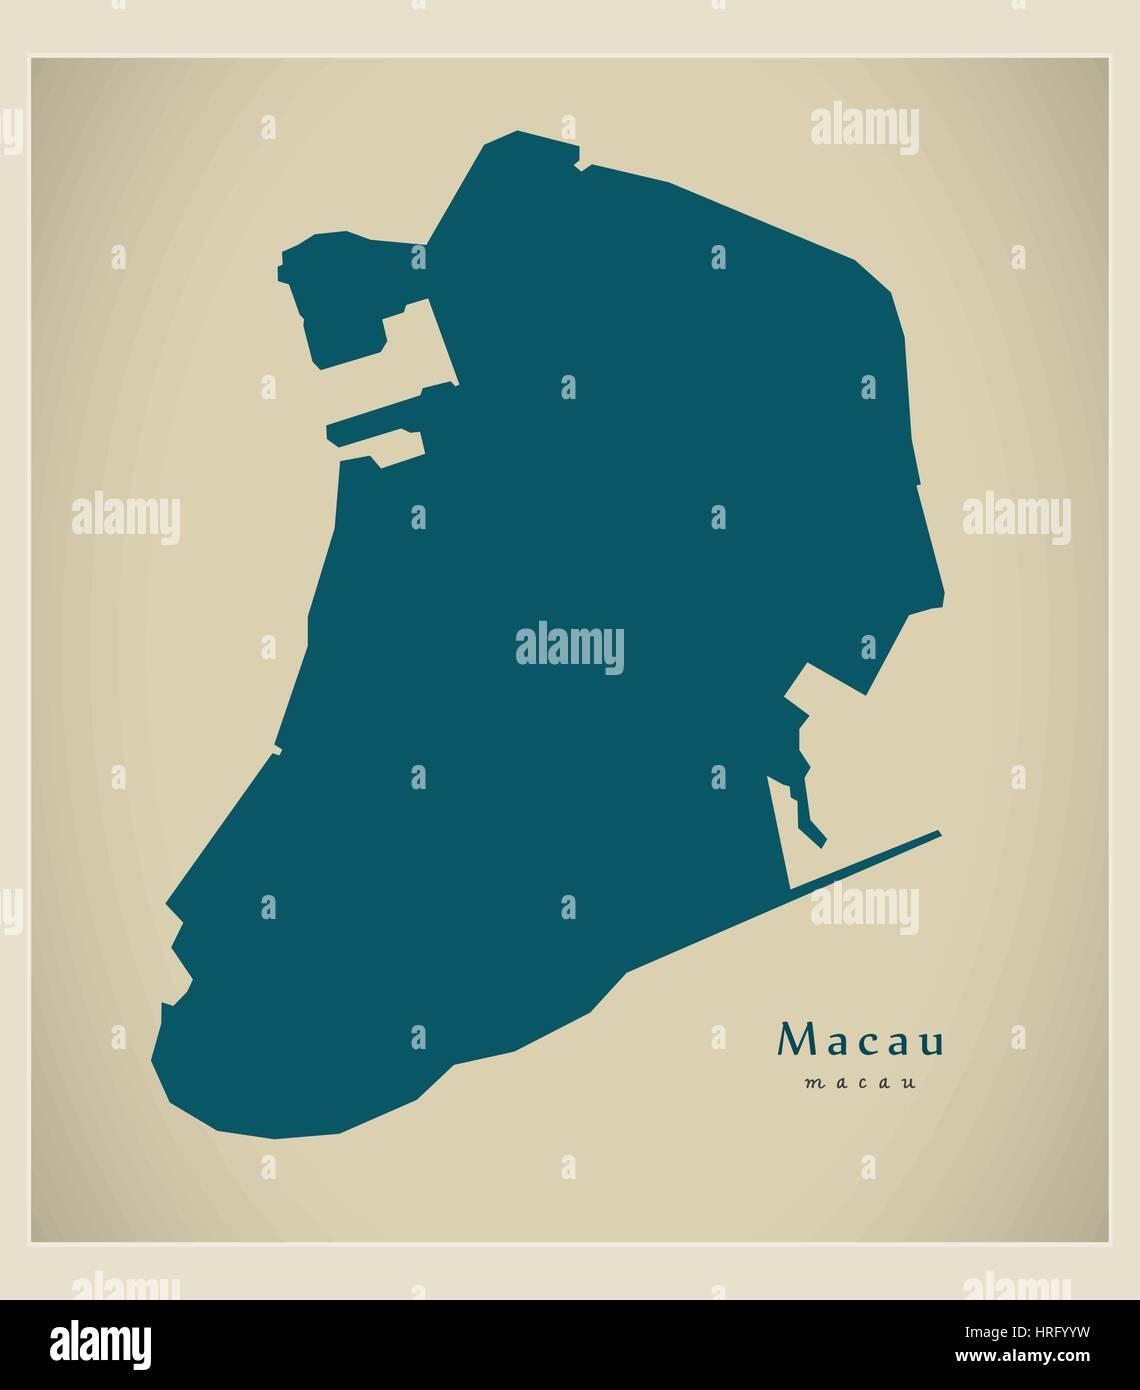 Modern Map - Macau - Stock Image